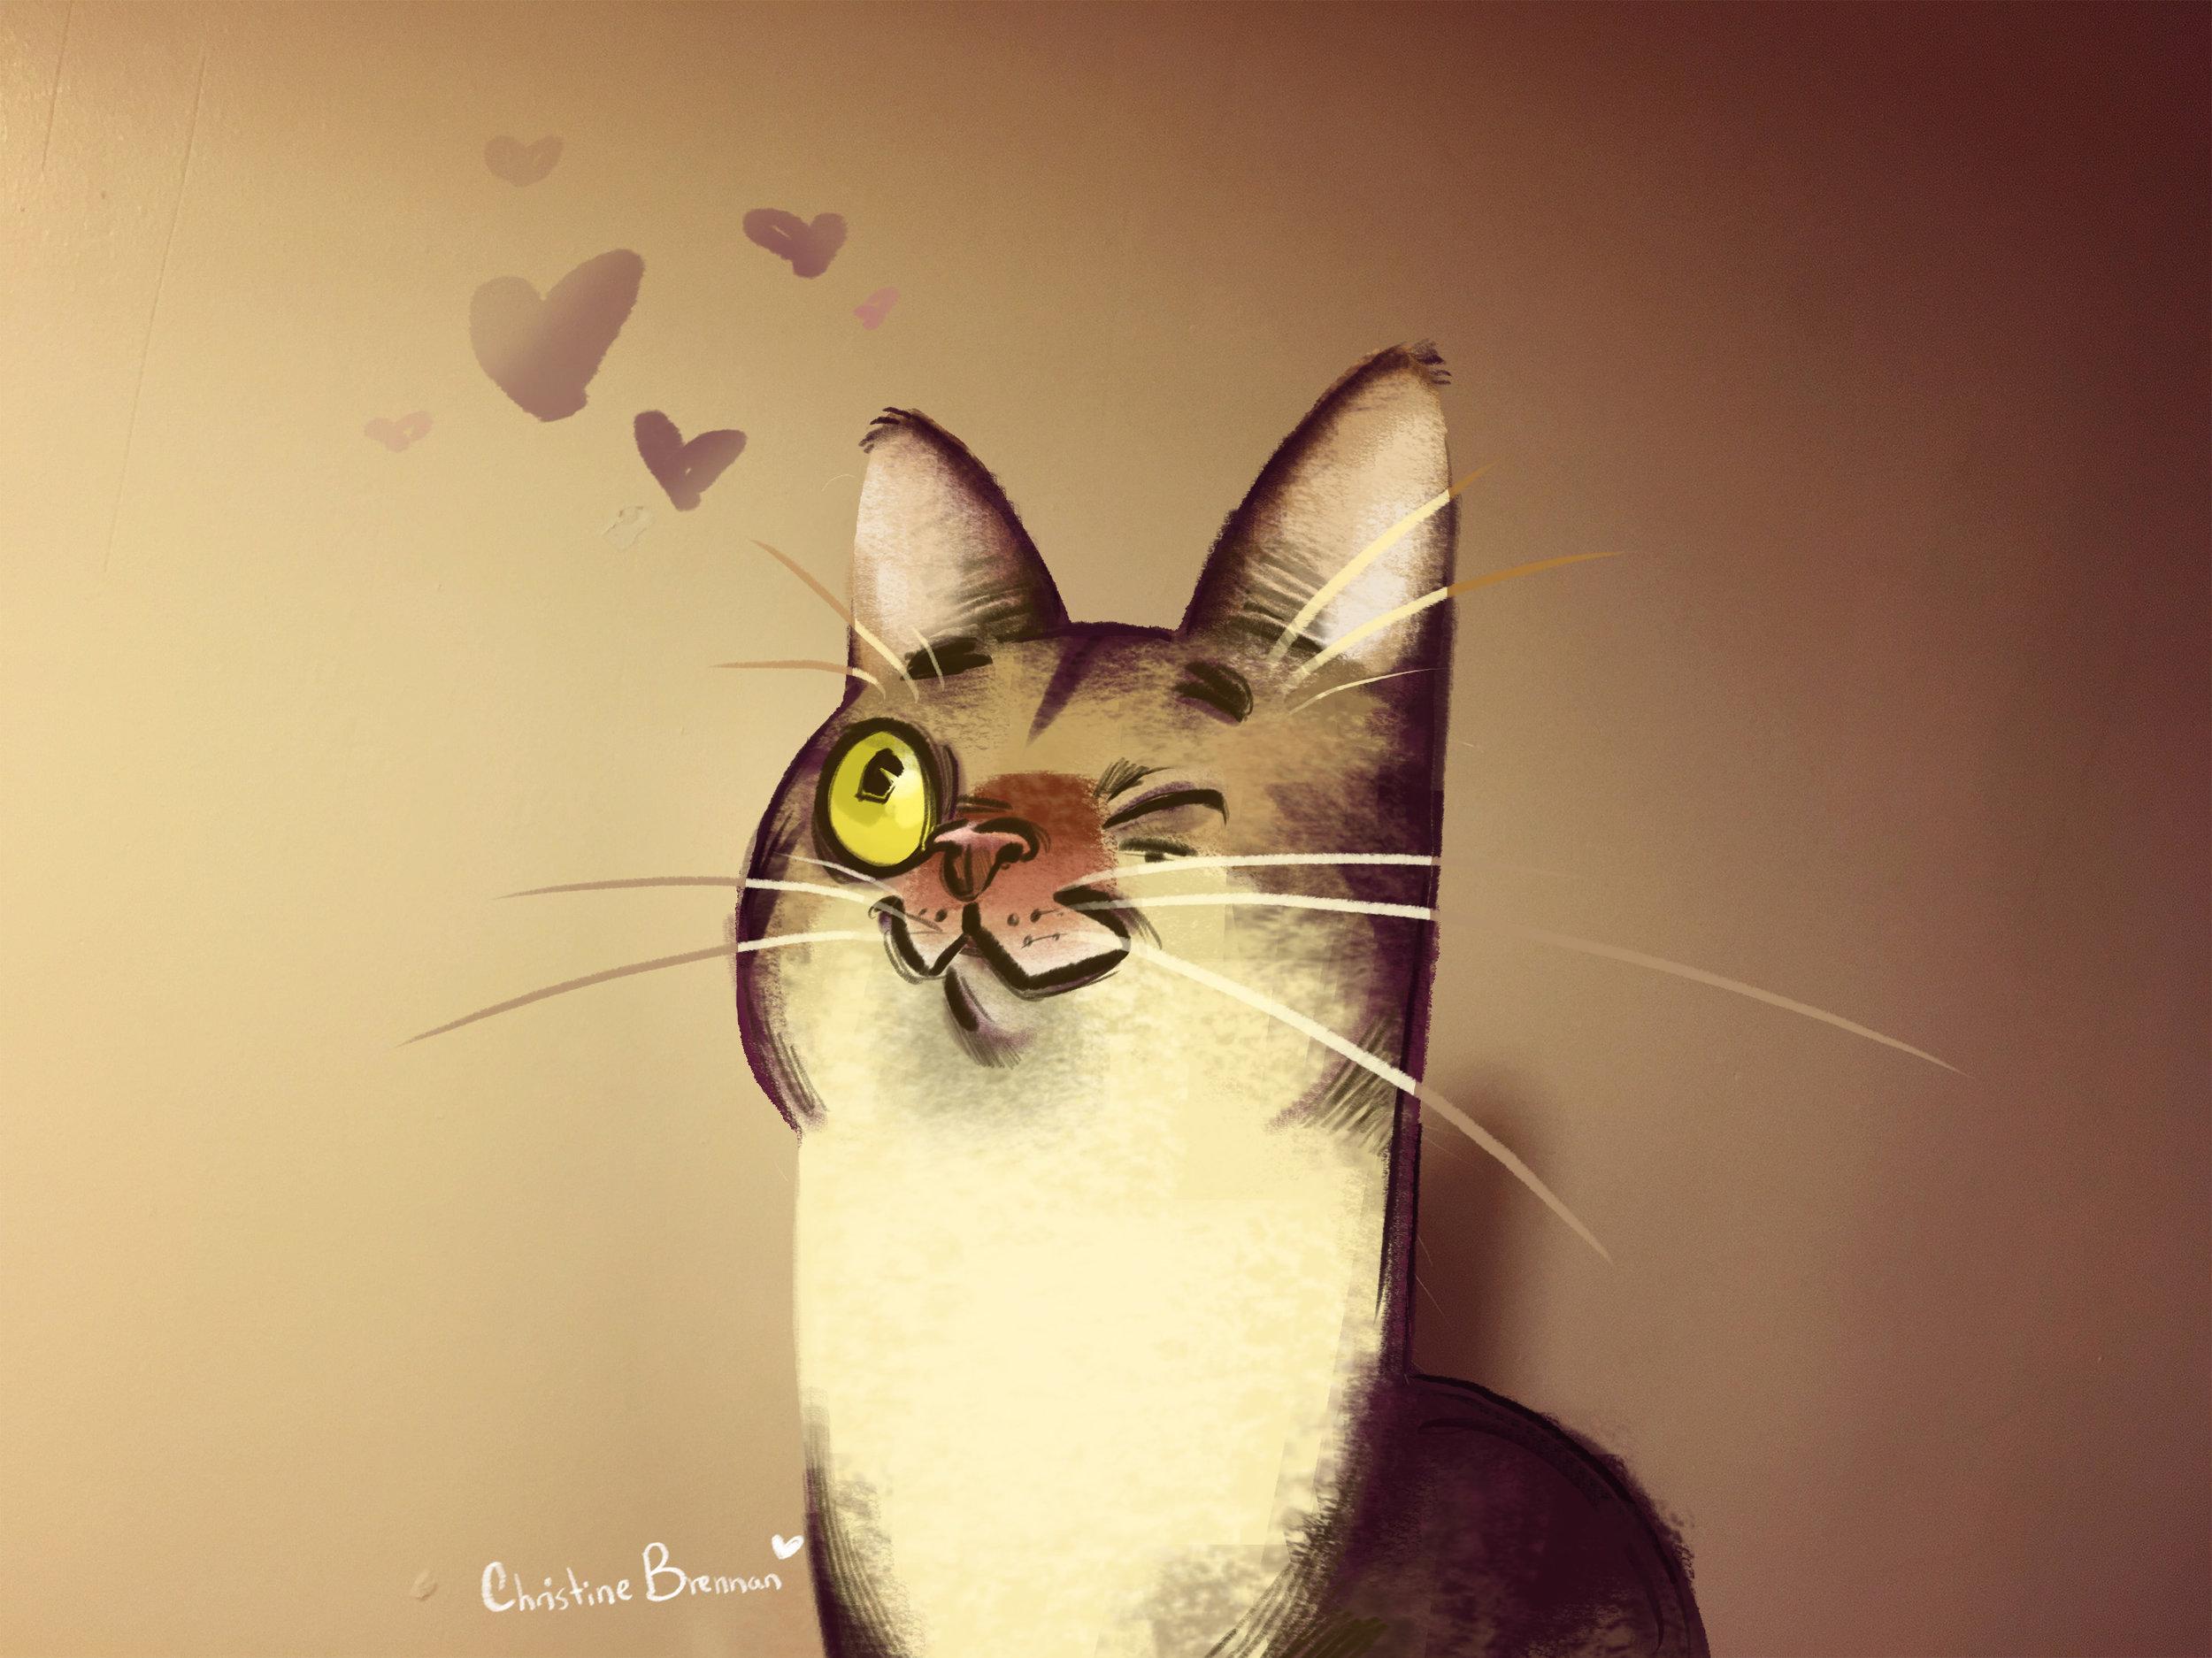 ChristineBrennan_cat!!.jpg